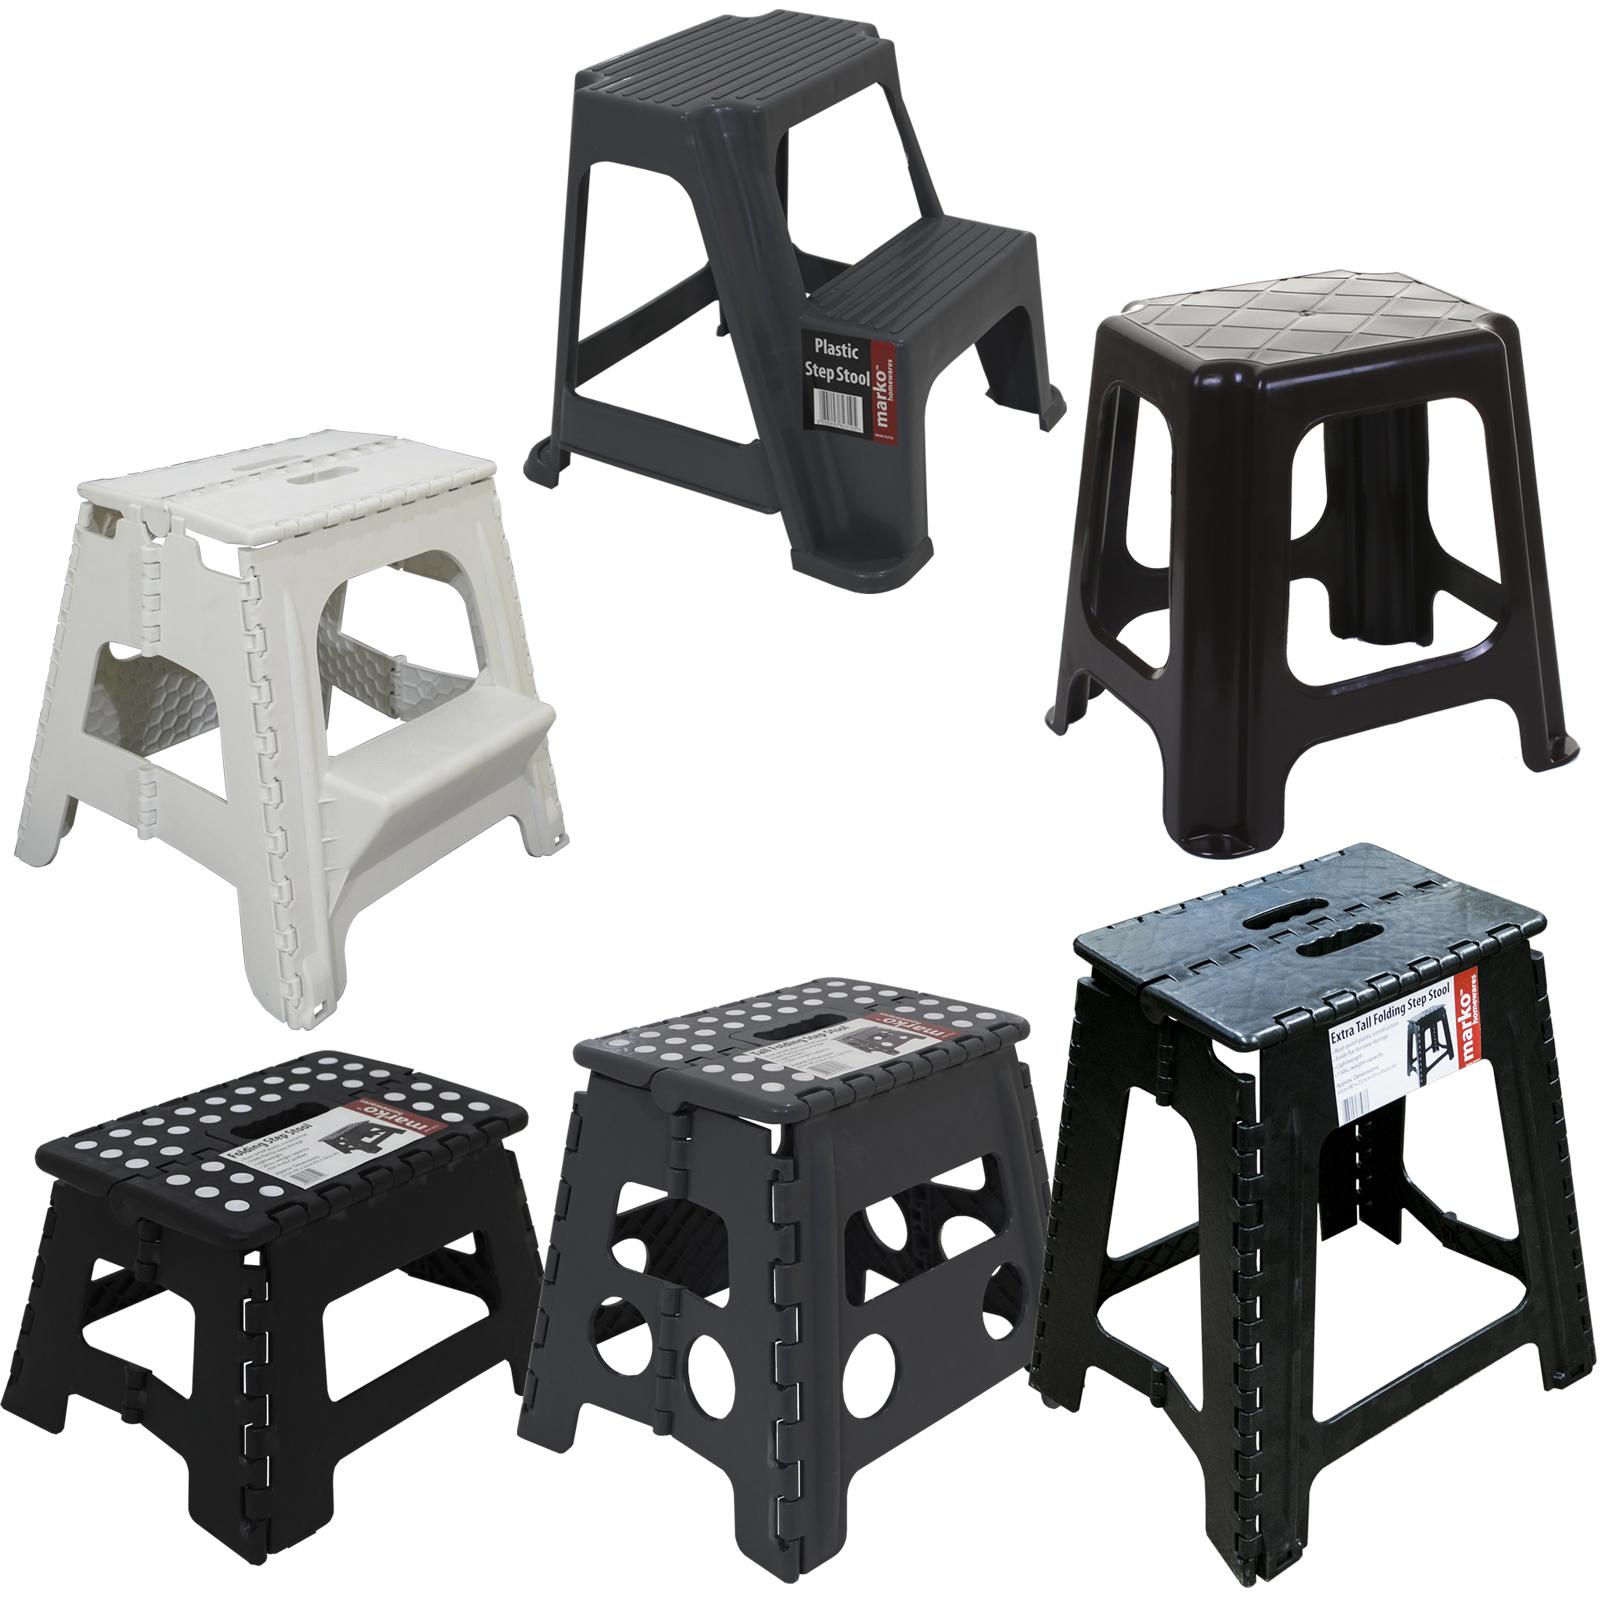 Tremendous Details About Plastic Folding Step Up Stool Heavy Duty 2 Step Stool Multi Purpose Caravan Home Lamtechconsult Wood Chair Design Ideas Lamtechconsultcom